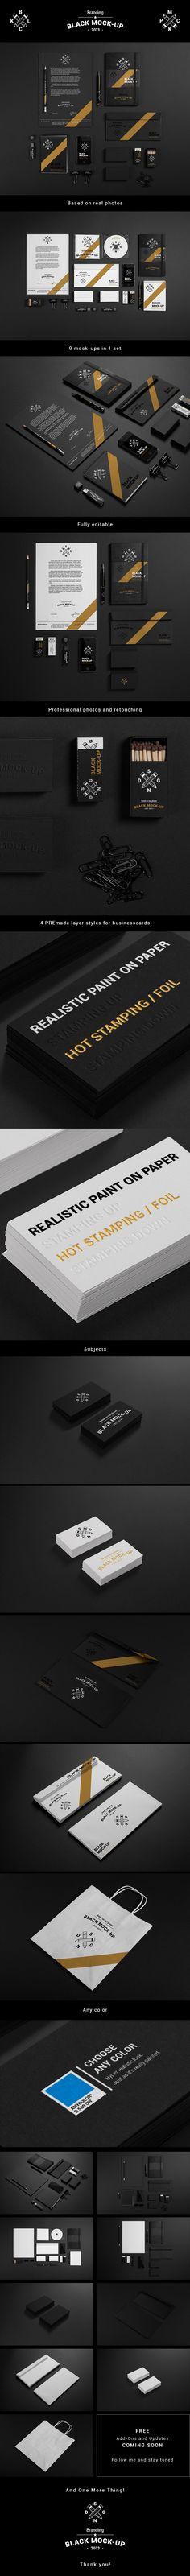 Stationery / Branding / Identity Mock-up on Behance